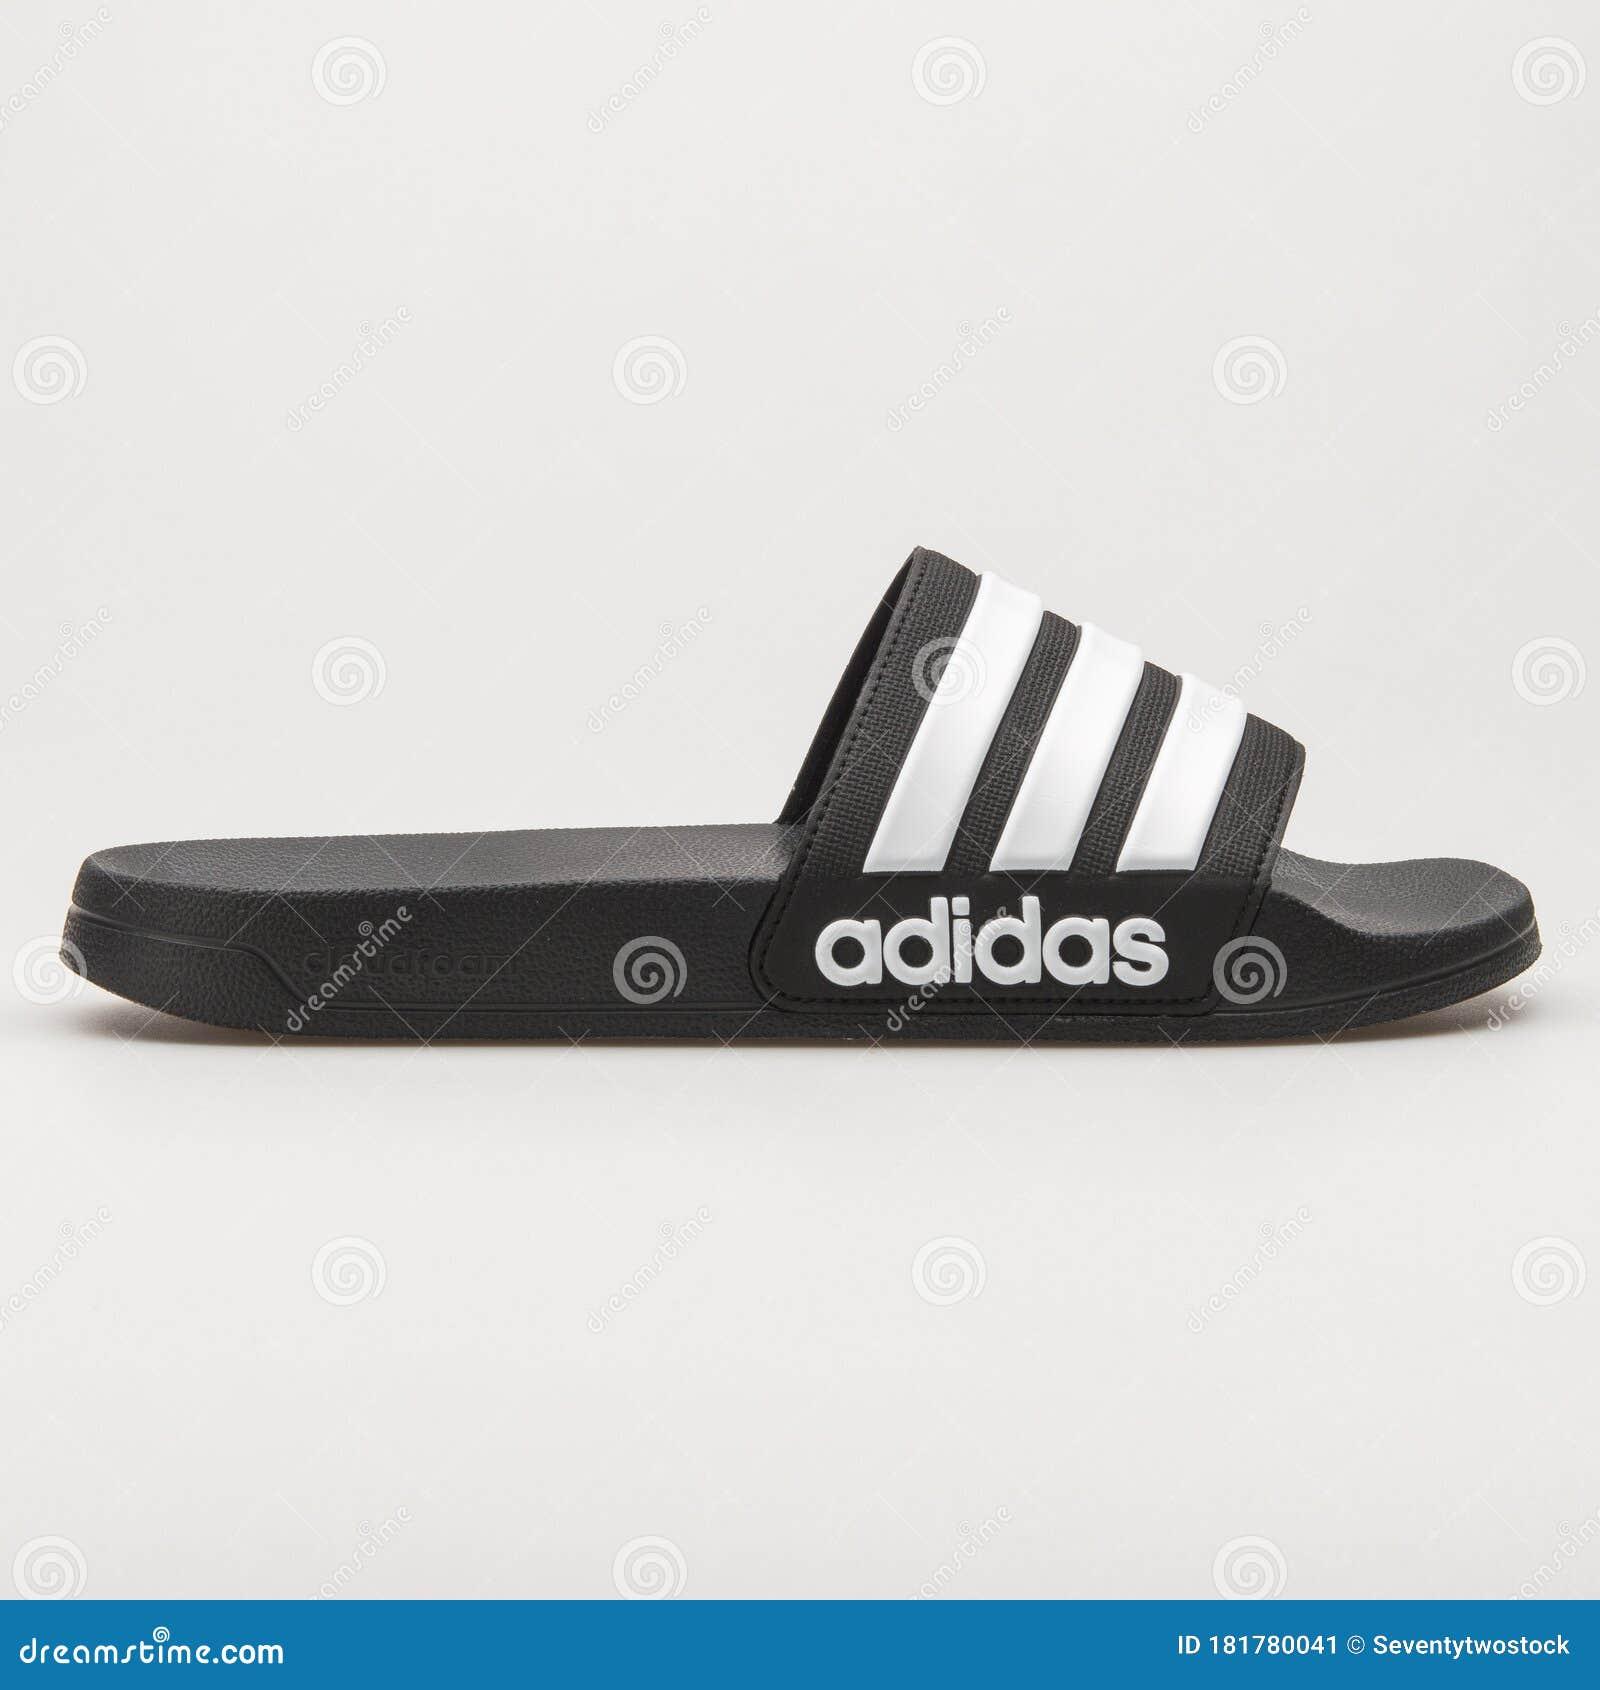 Adidas Adilette Shower Black And White